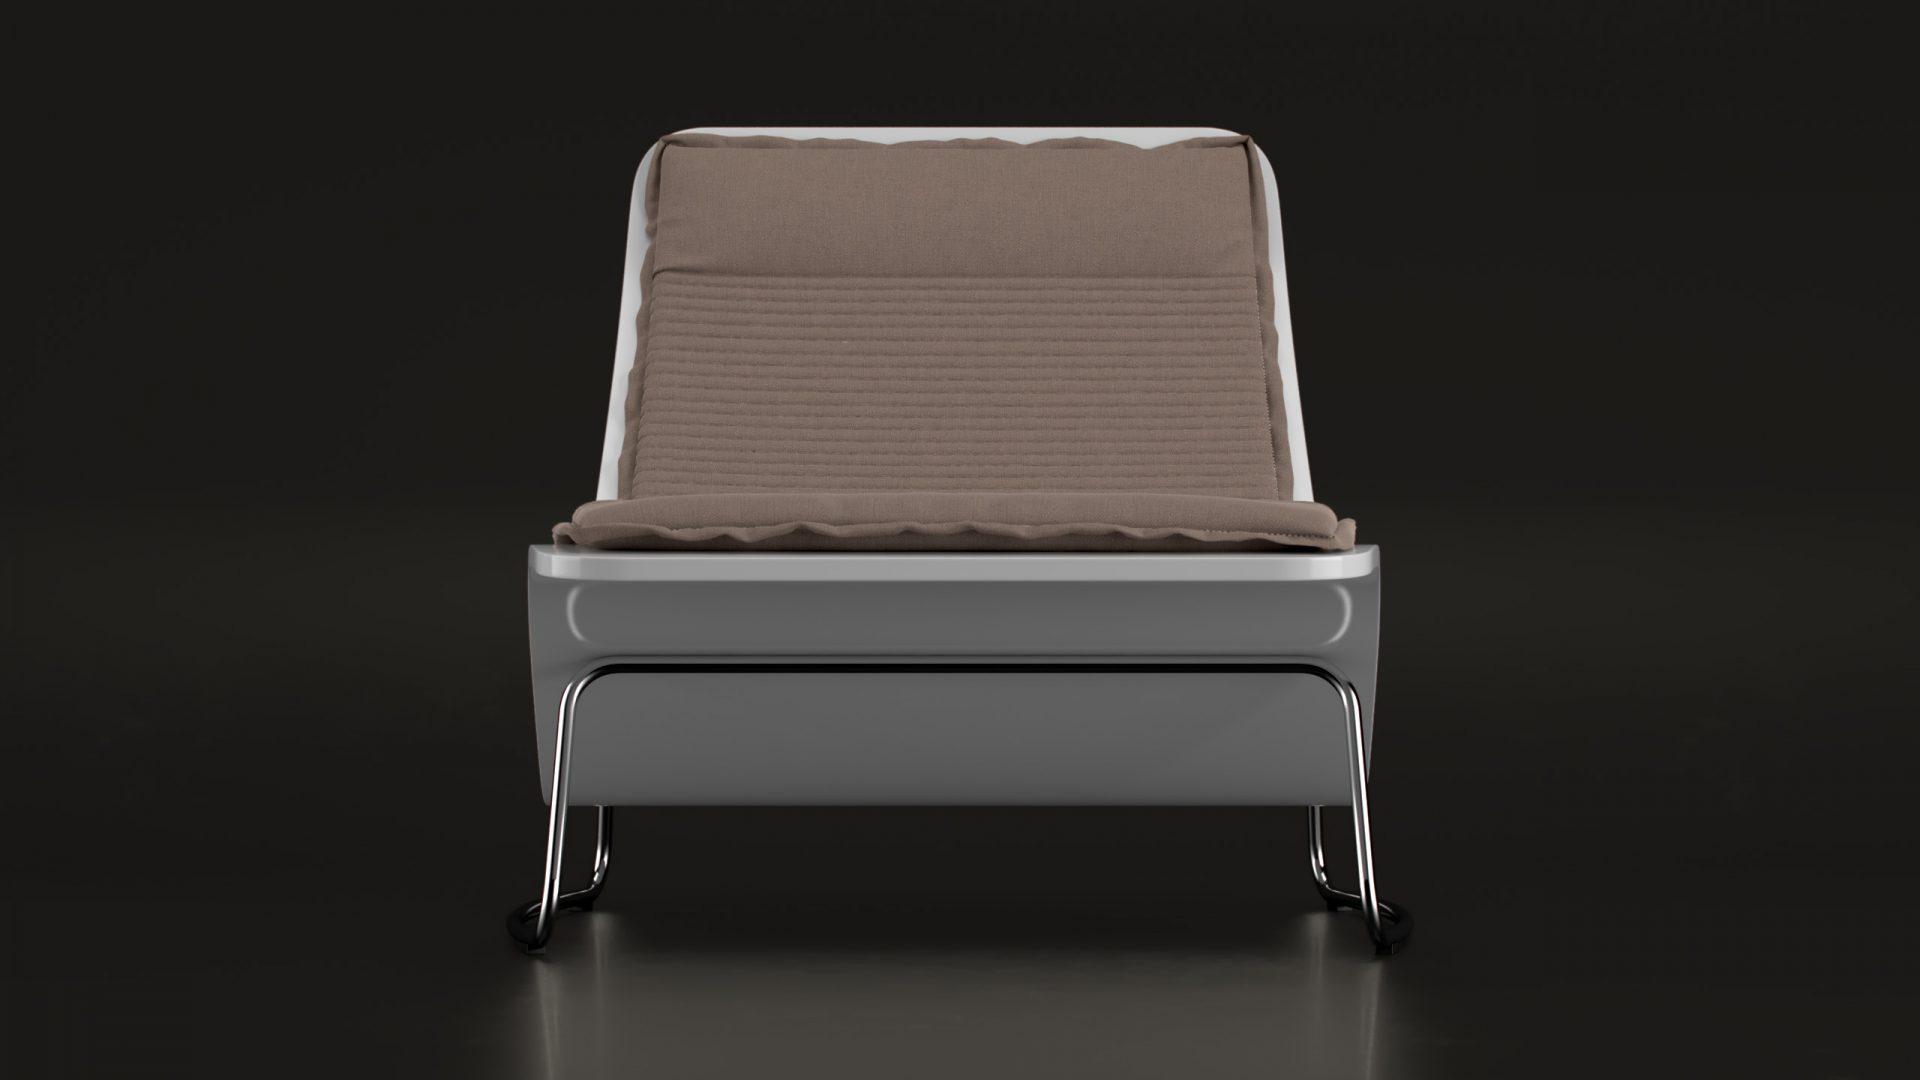 Vintage_ChaiseLounge_Couchs_001_BlackSet_01_V1.01_0002